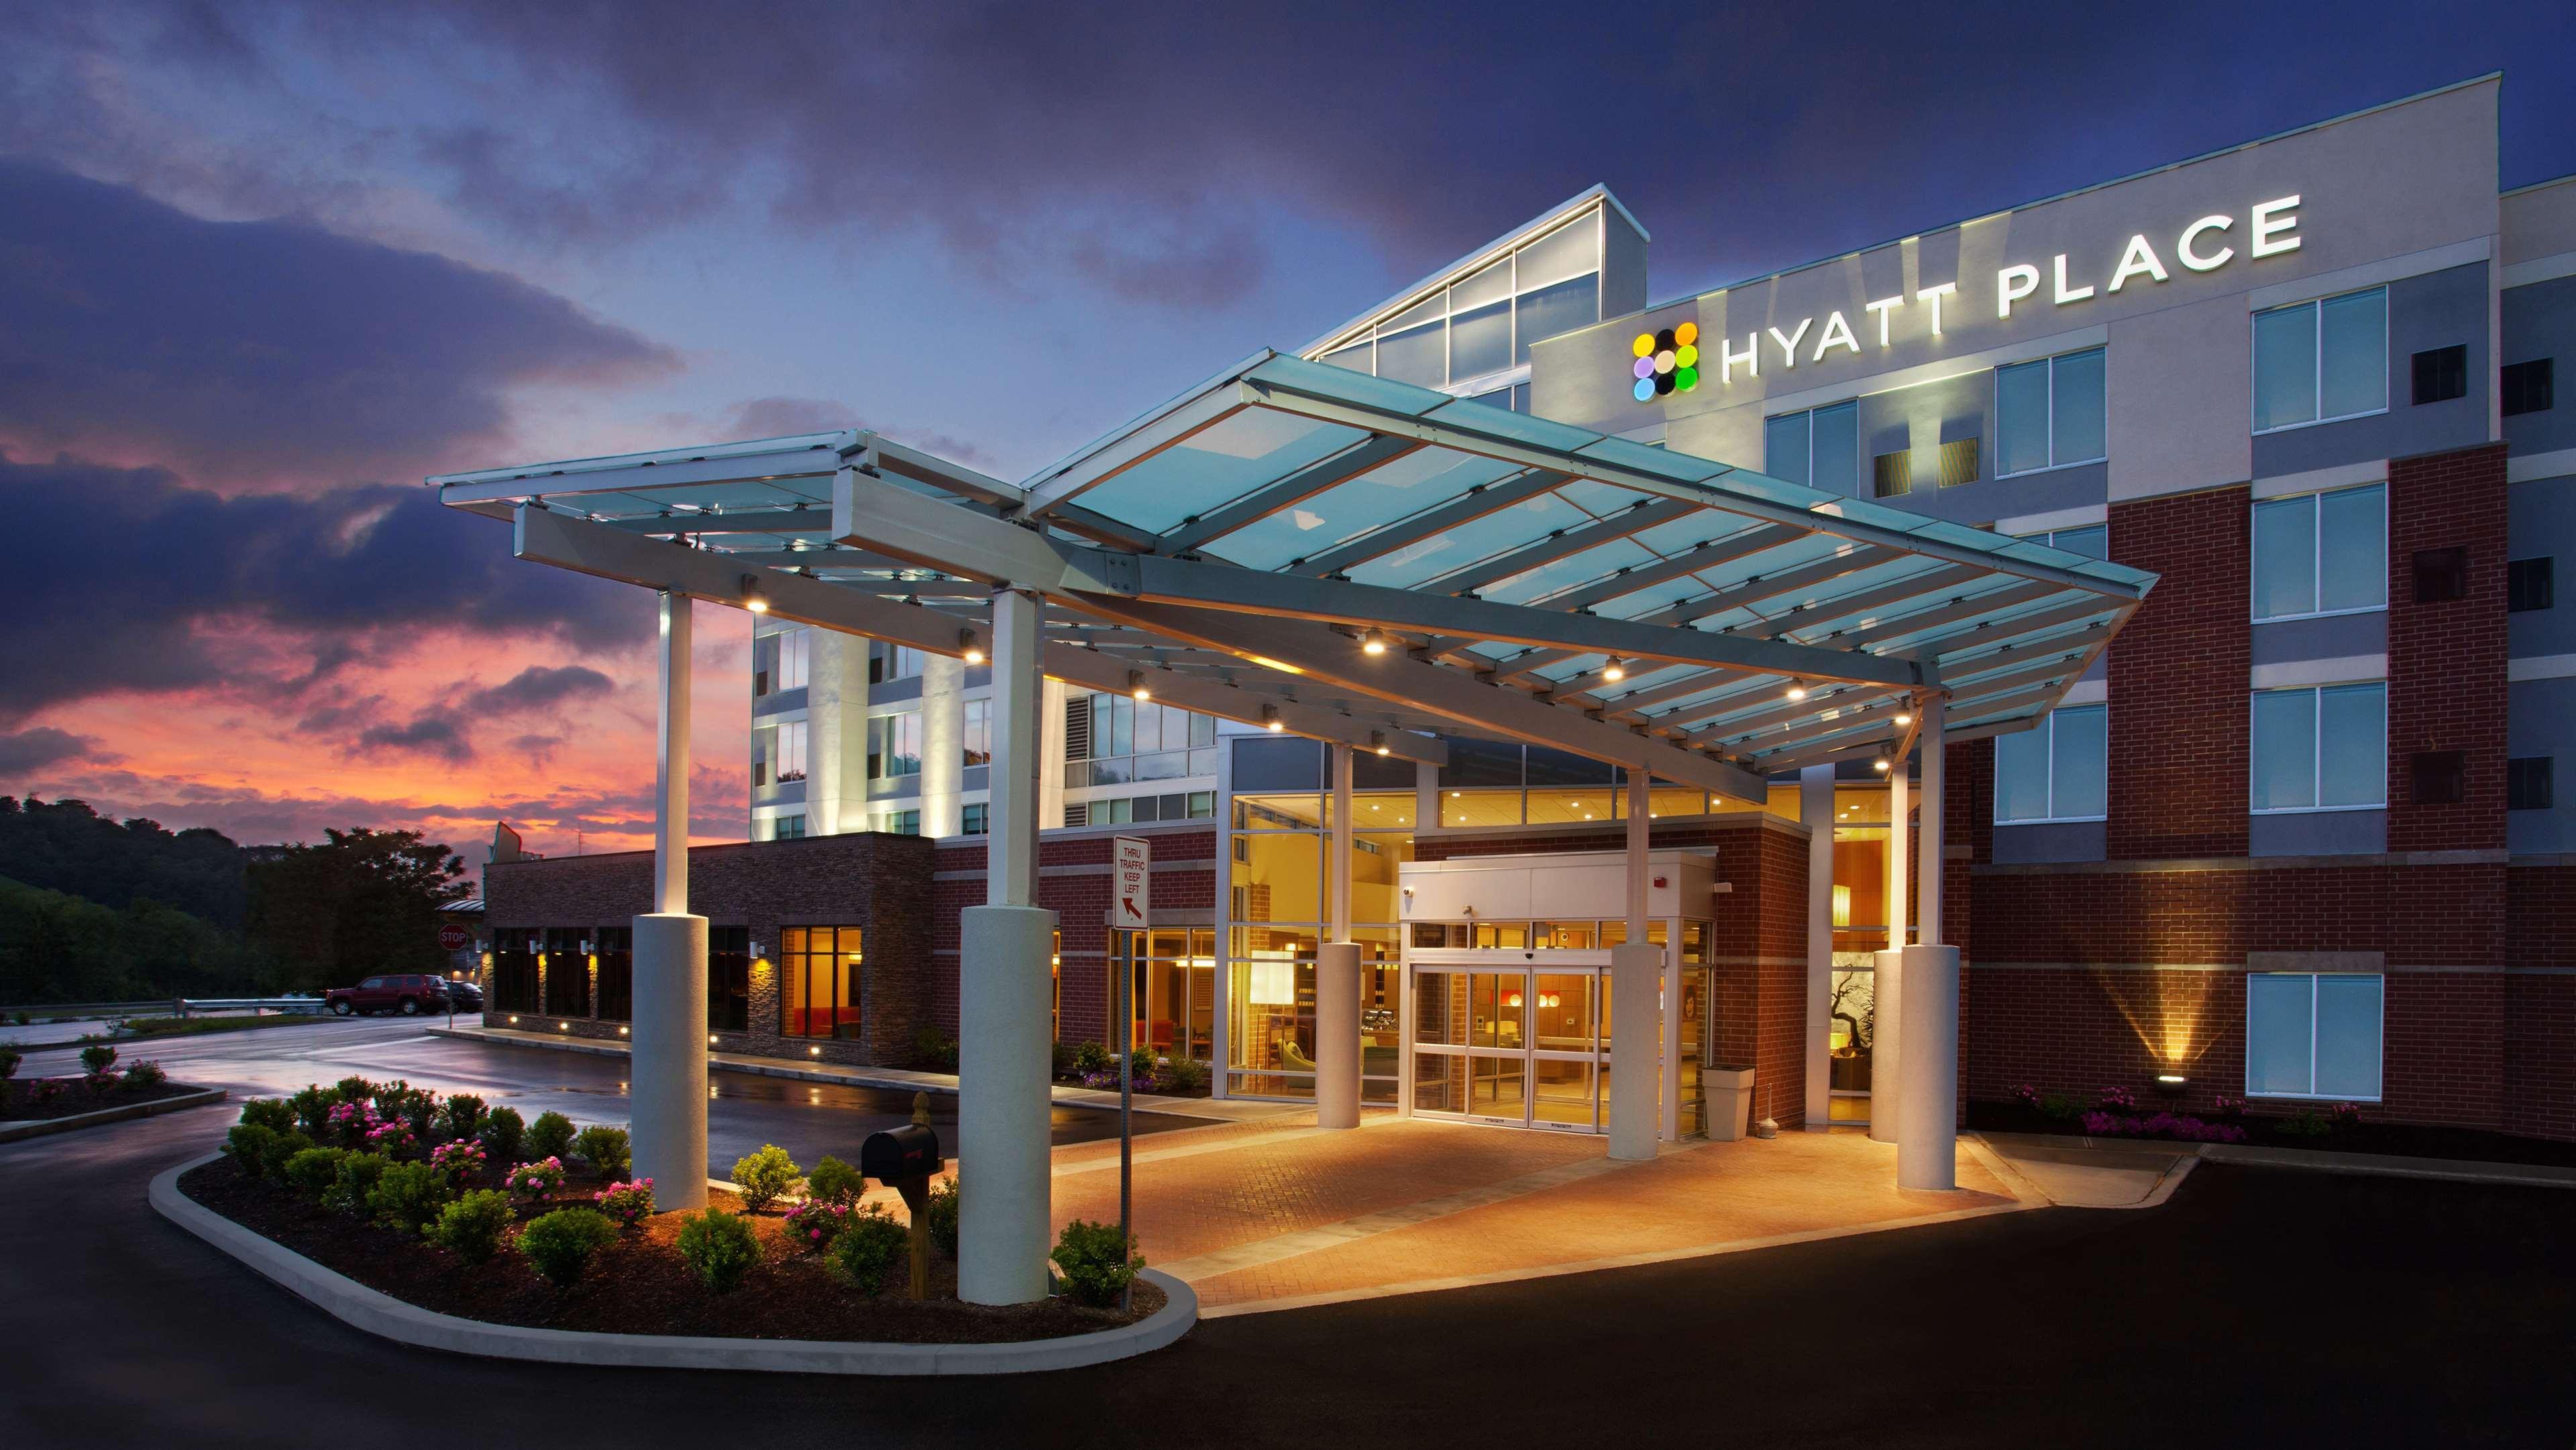 Hyatt Place Pitt S Meadows Casino, Washington